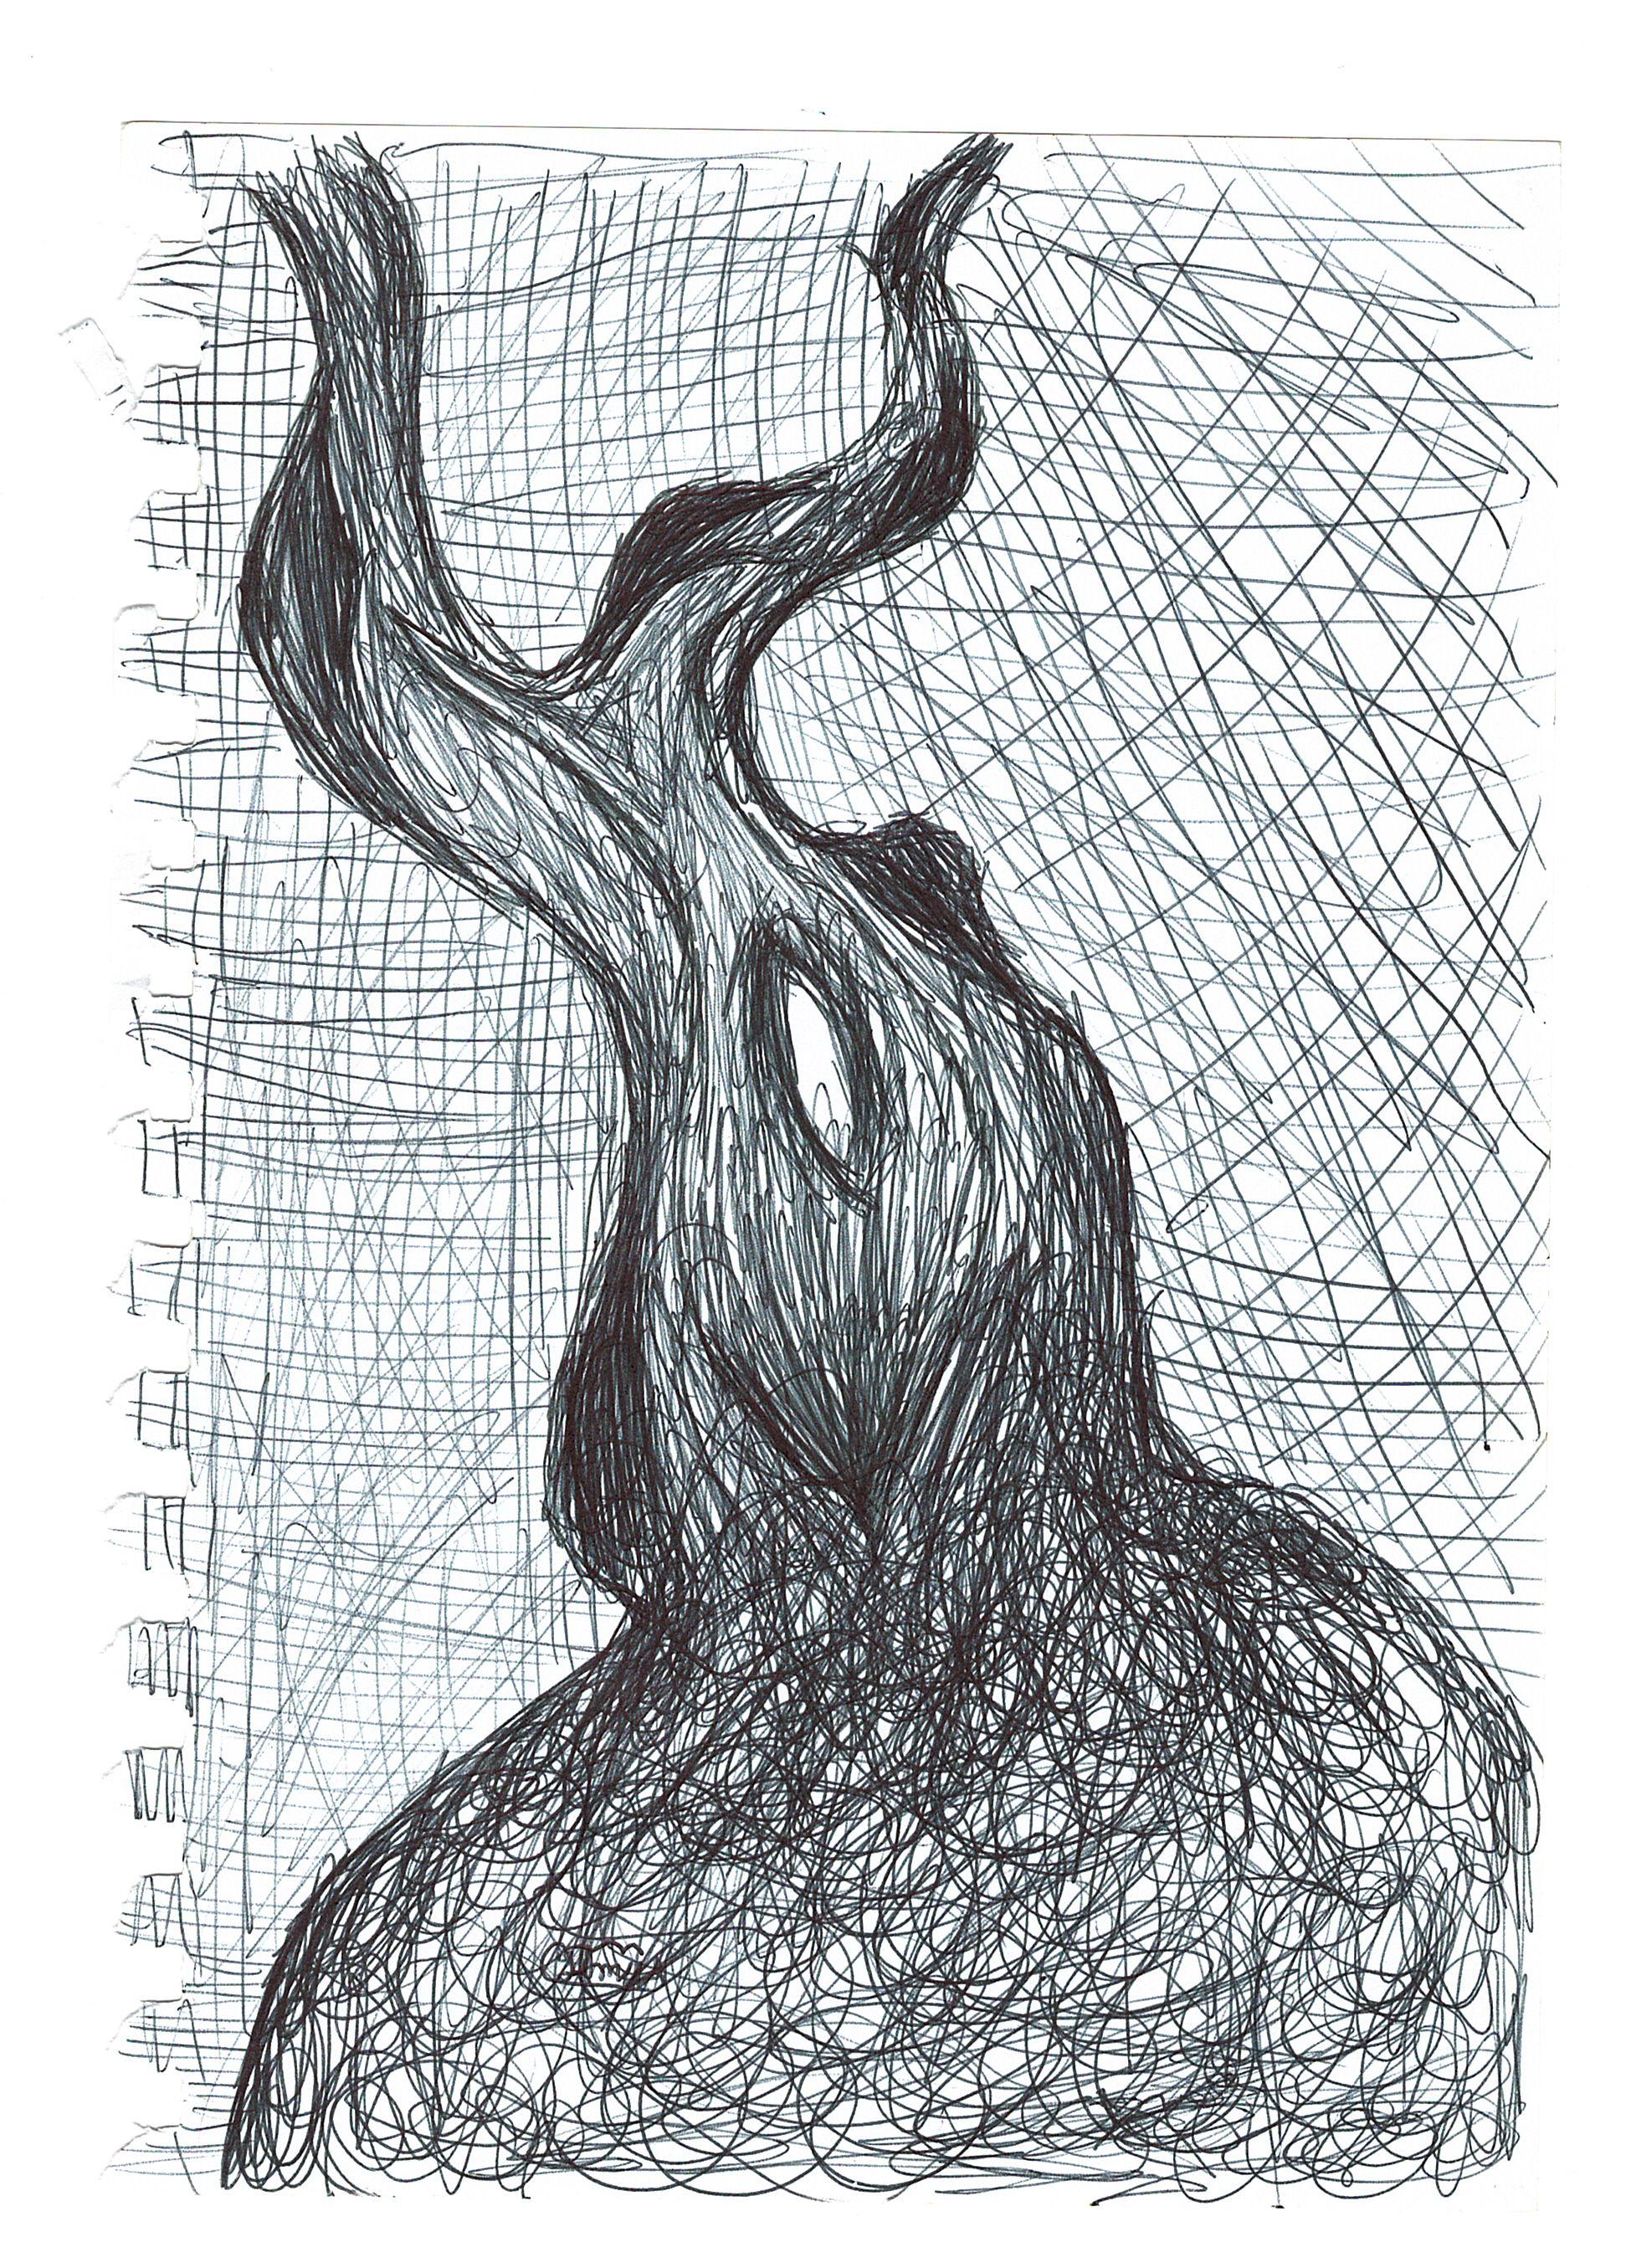 age 13 drawings 4